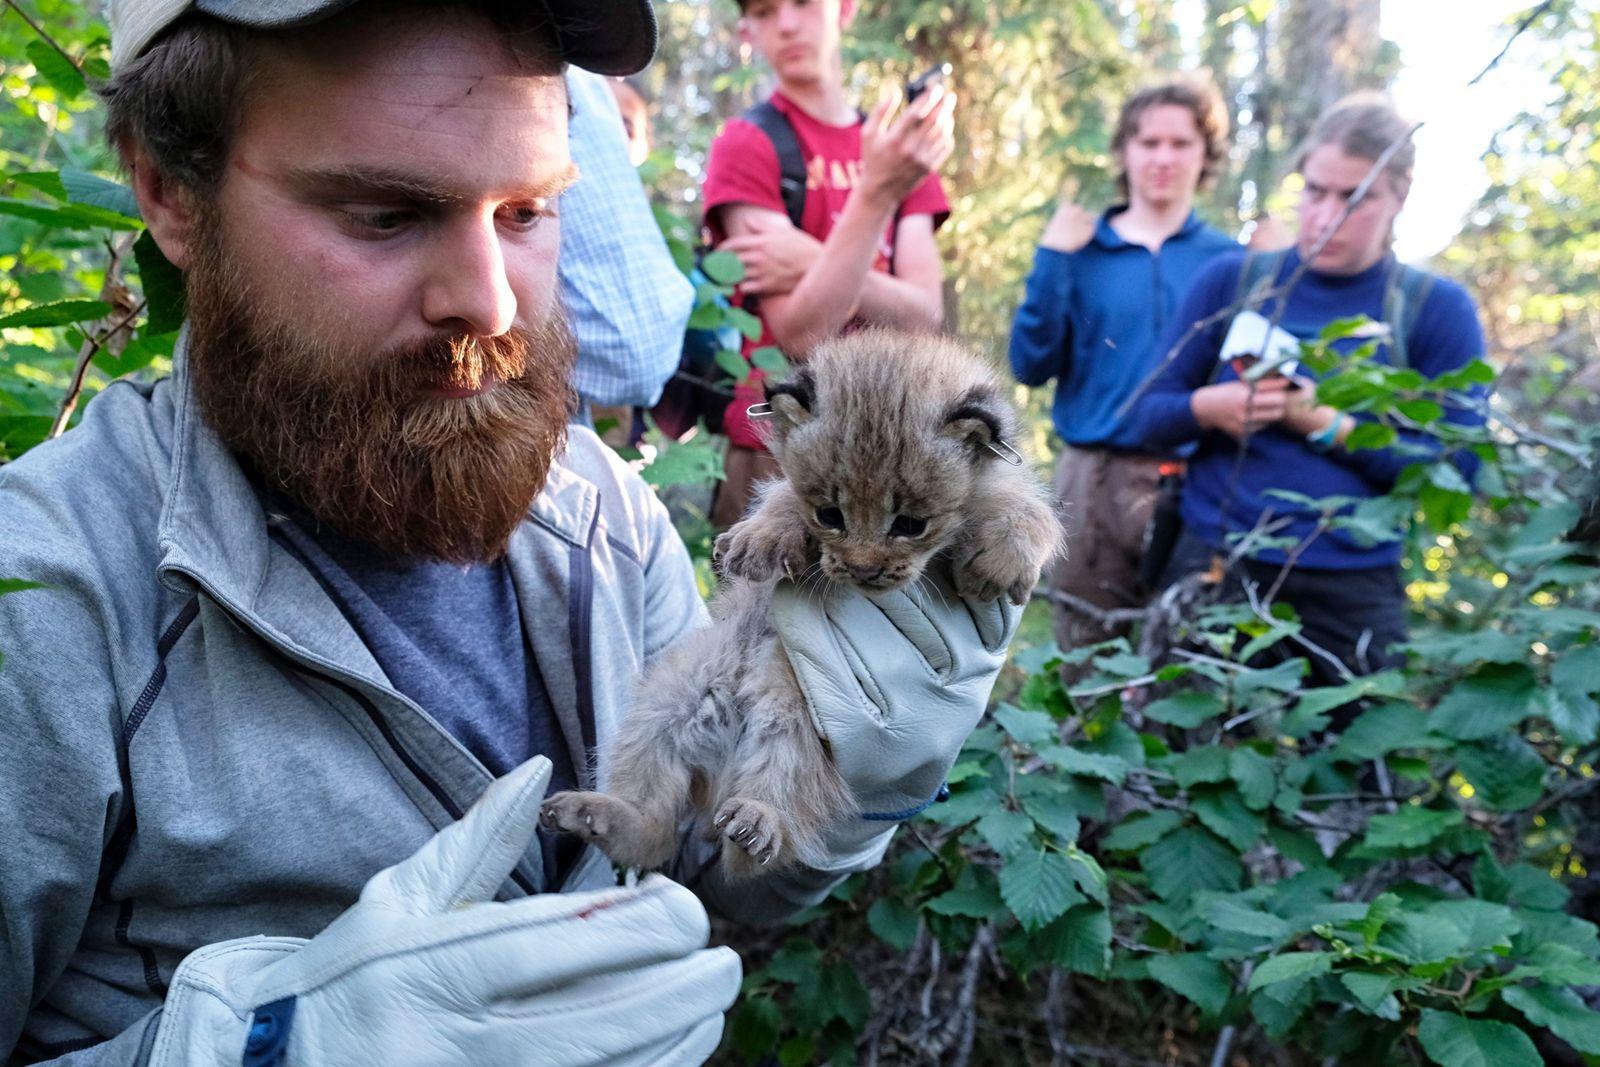 A scientist with the University of Alaska Fairbanks examines a lynx kitten in Alaska in spring ...